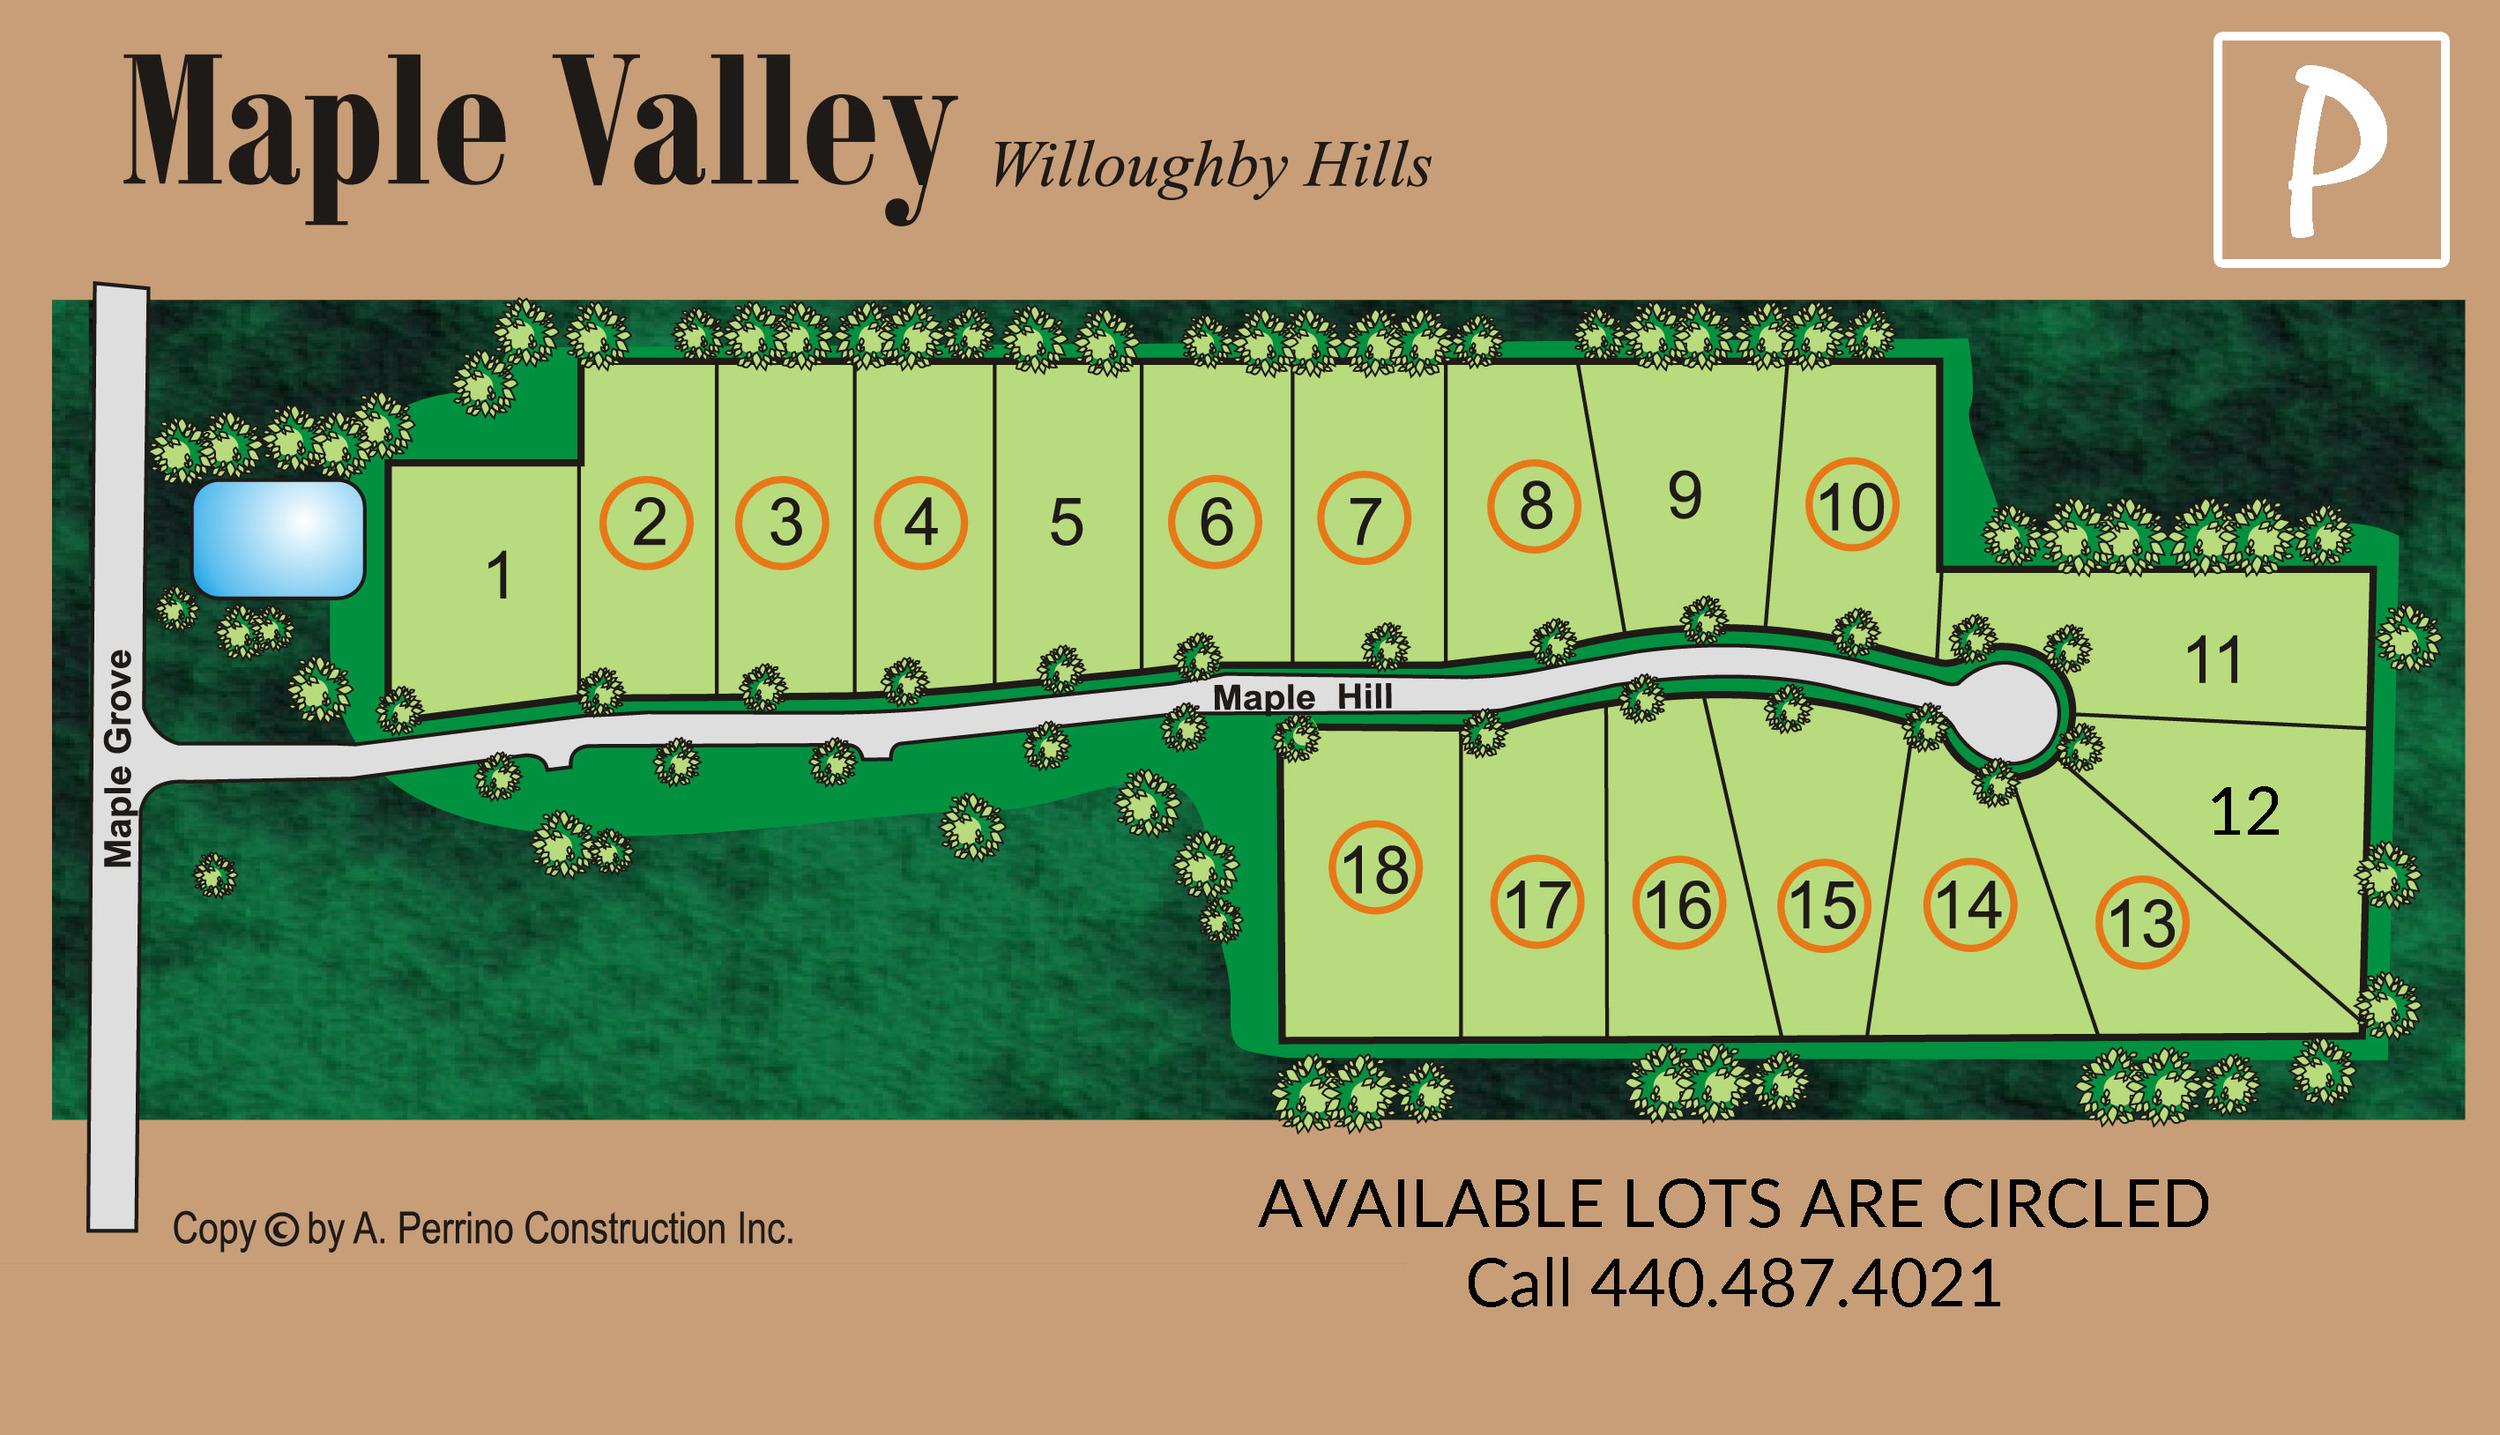 PP Maple Valley Map 1 31 14_1.jpg